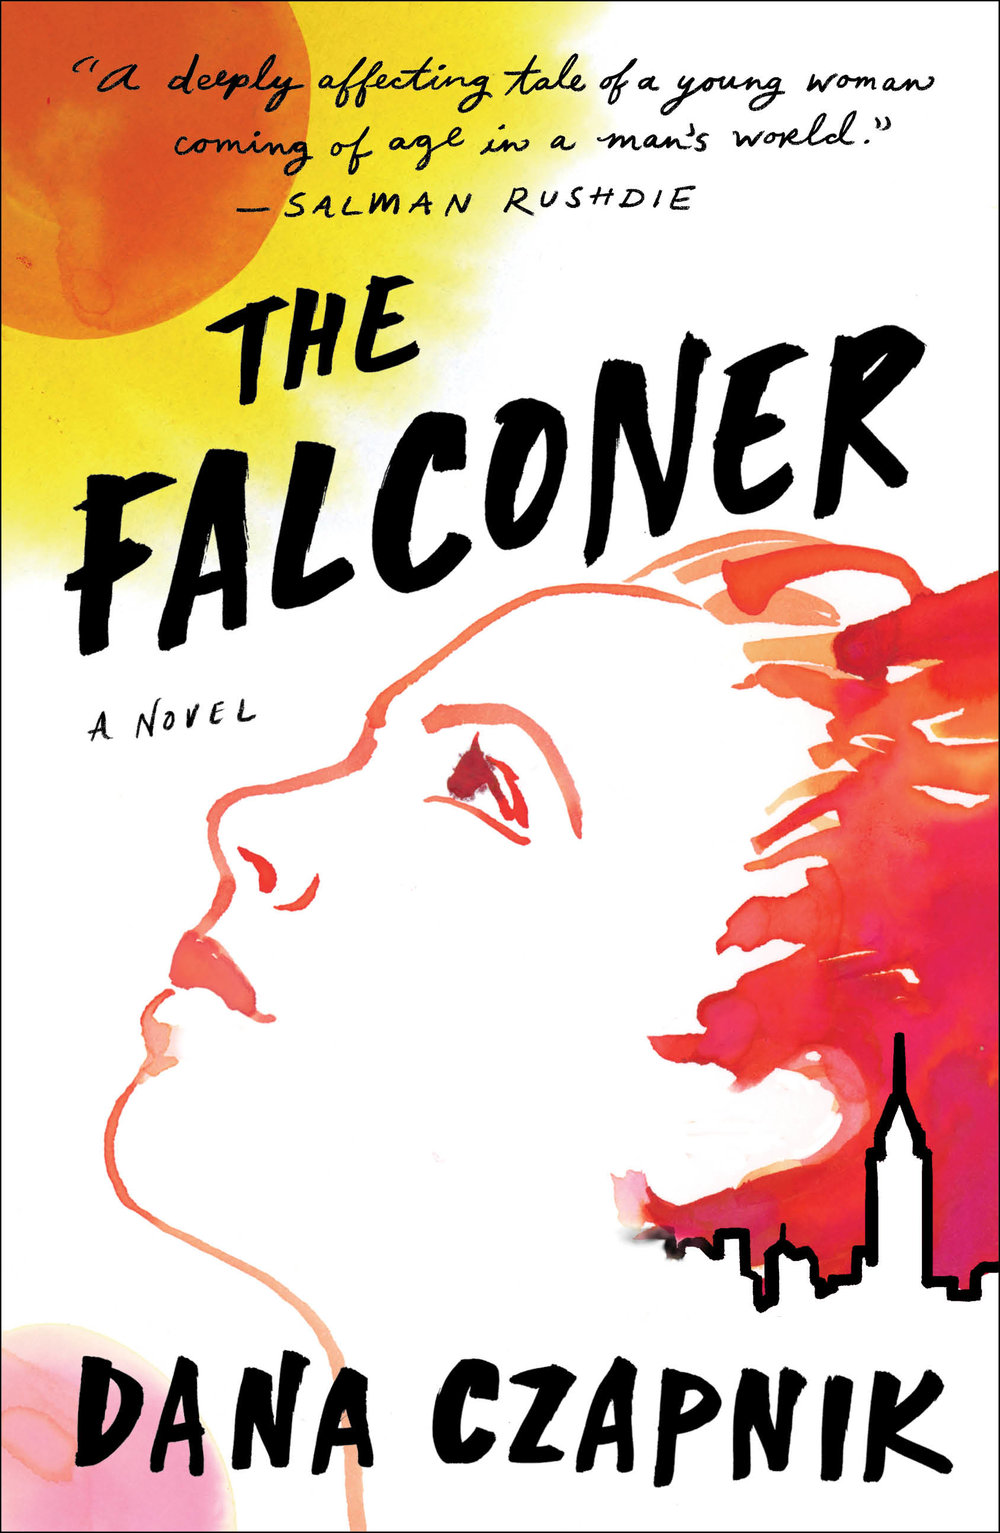 The Falconer Cover.jpg